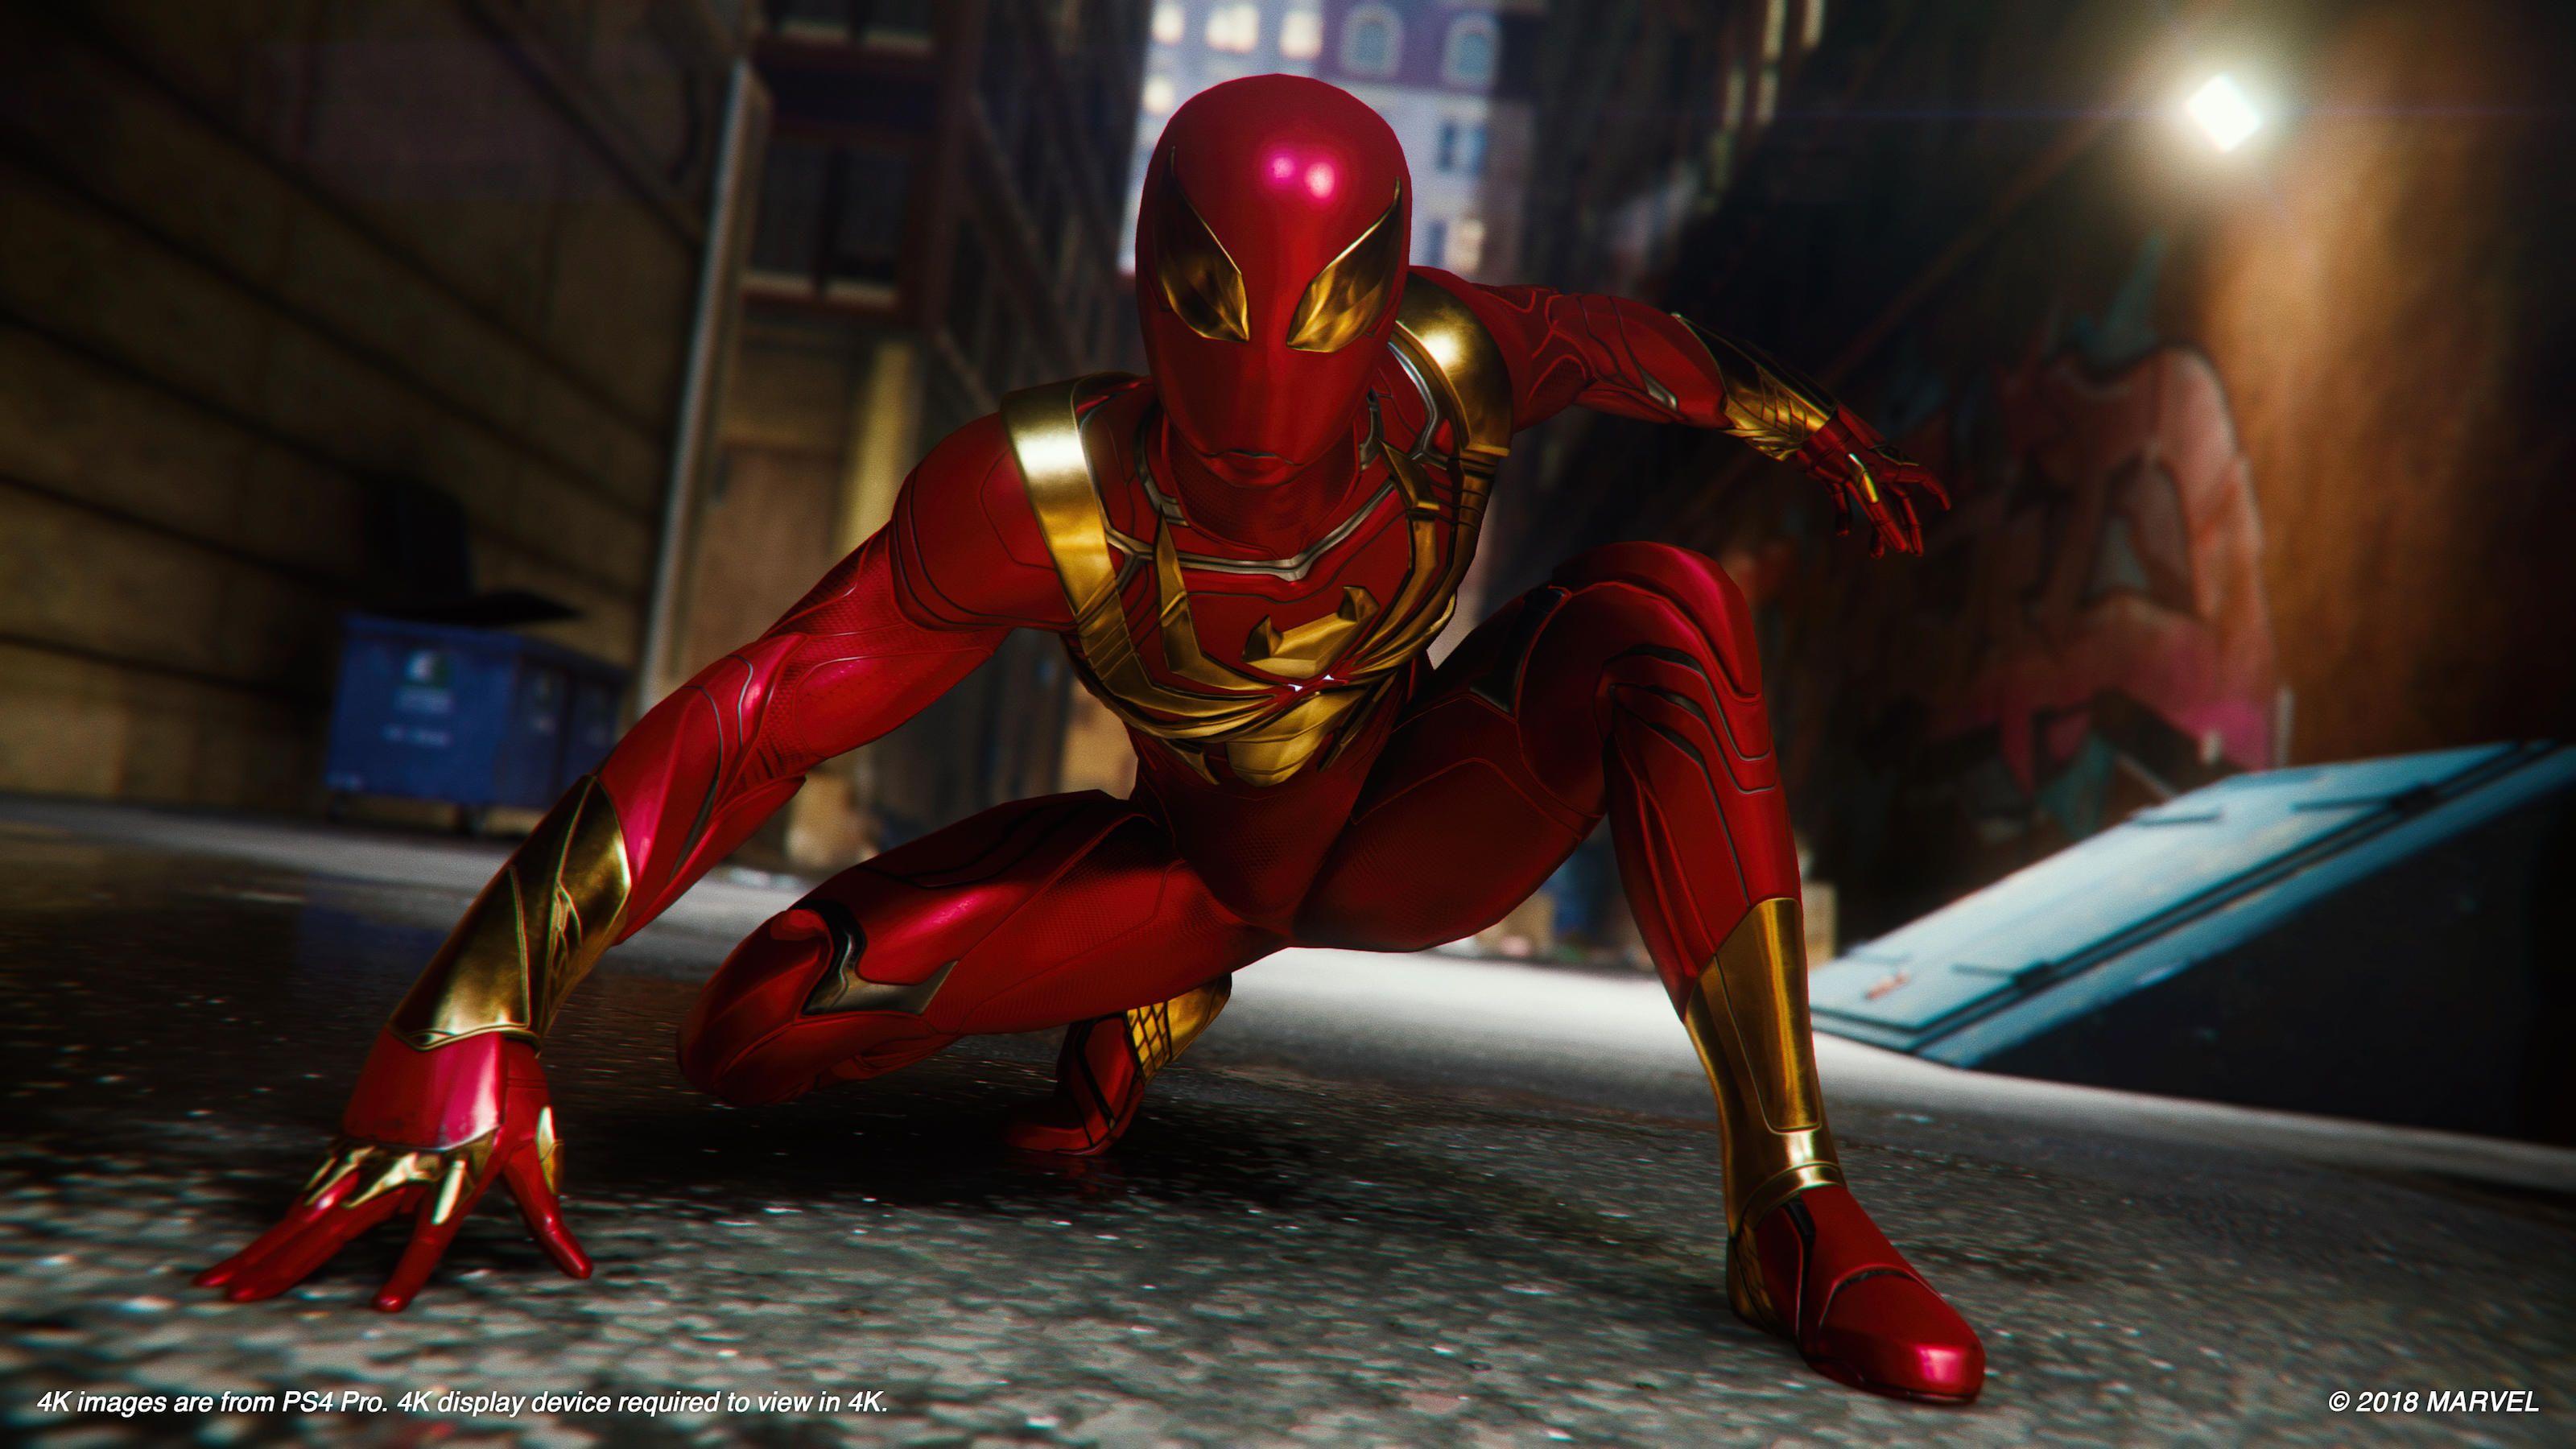 Download The 'Marvel's Spider-Man: Turf Wars' DLC Chapter